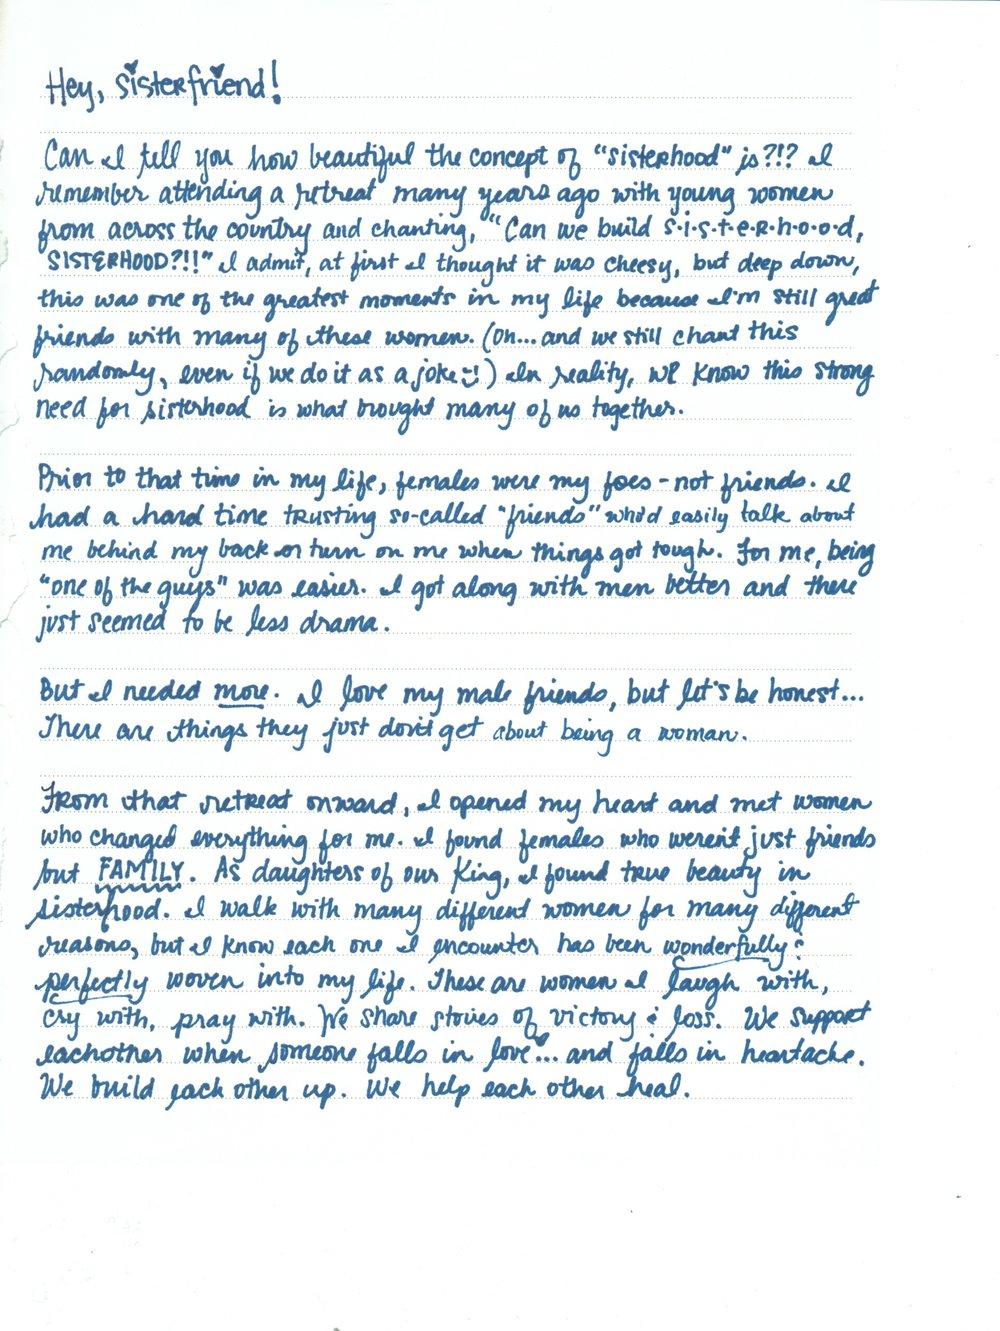 Marcris-Dizon-Letter-Scan-1